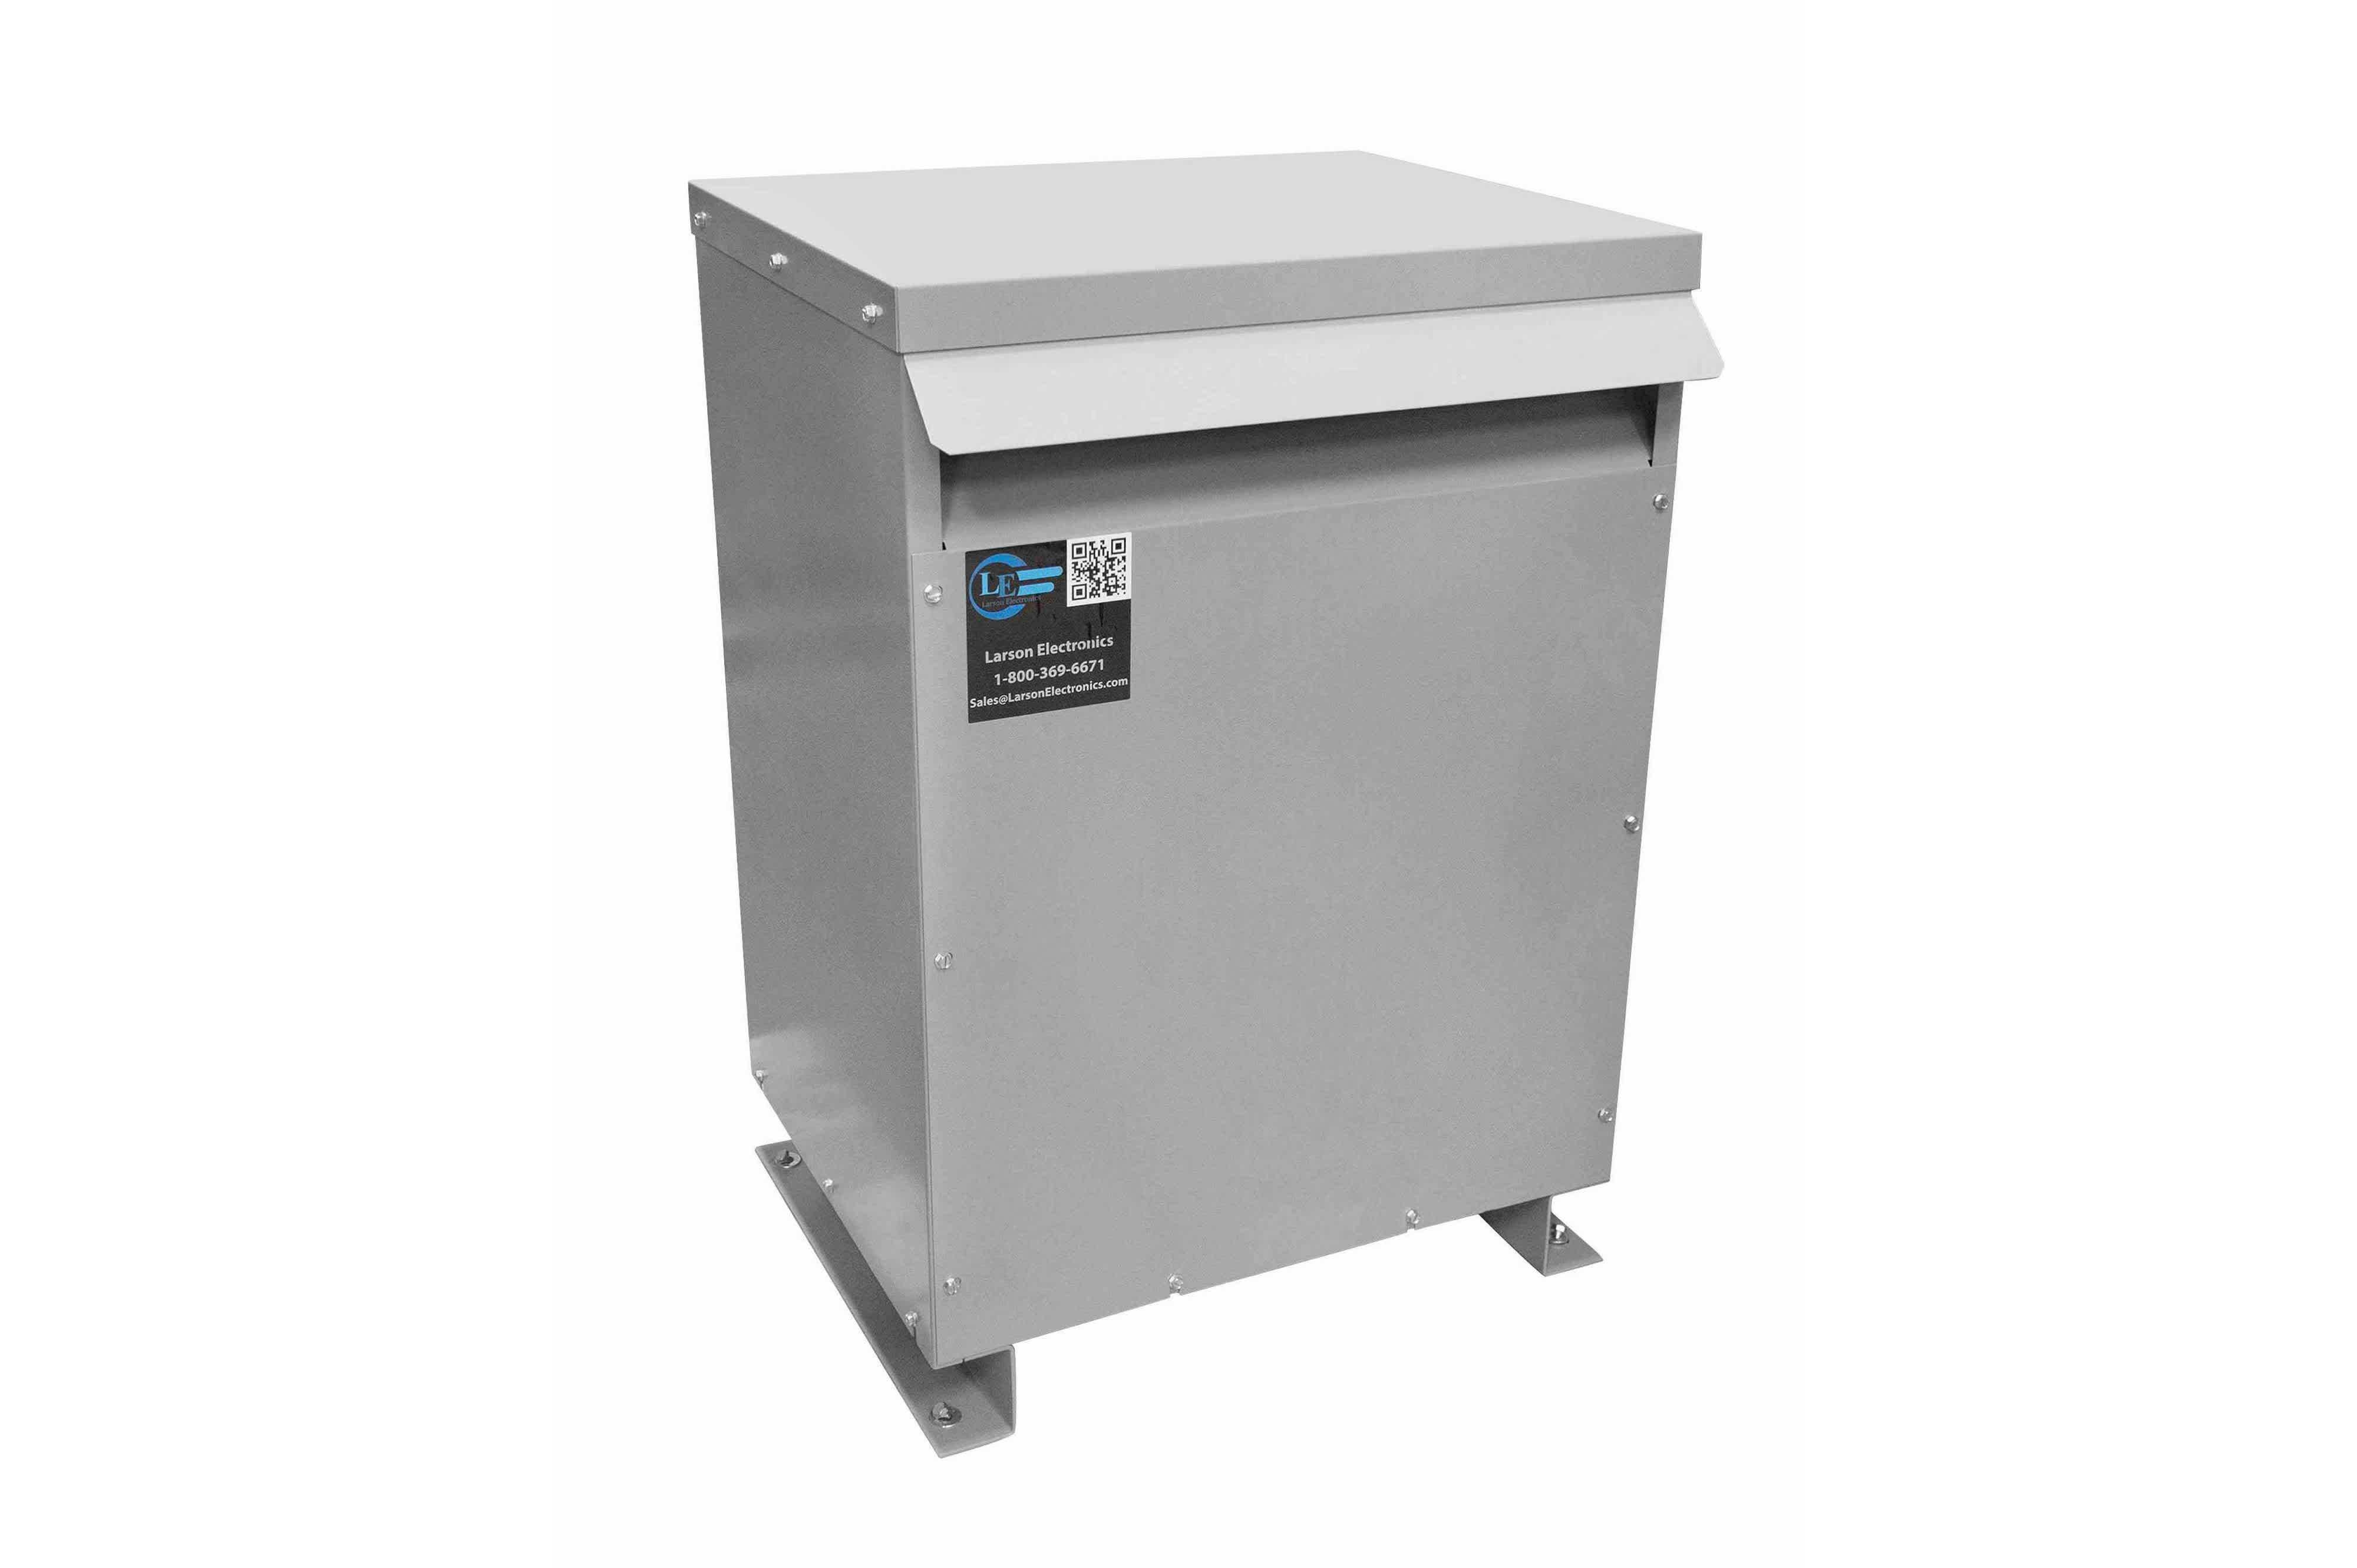 47.5 kVA 3PH Isolation Transformer, 208V Wye Primary, 380V Delta Secondary, N3R, Ventilated, 60 Hz